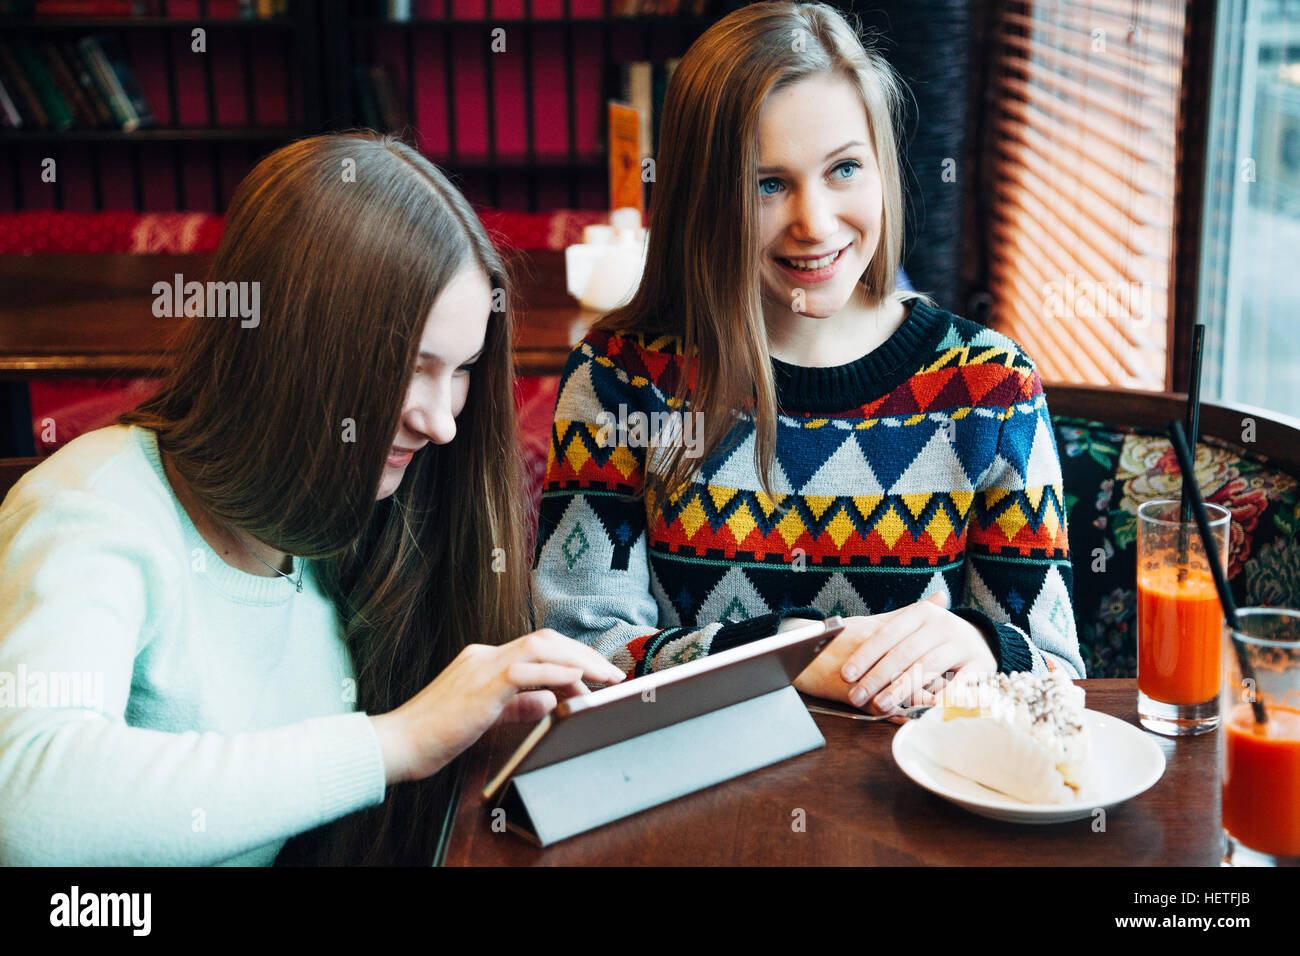 Selfie girls in cafe - Stock Image